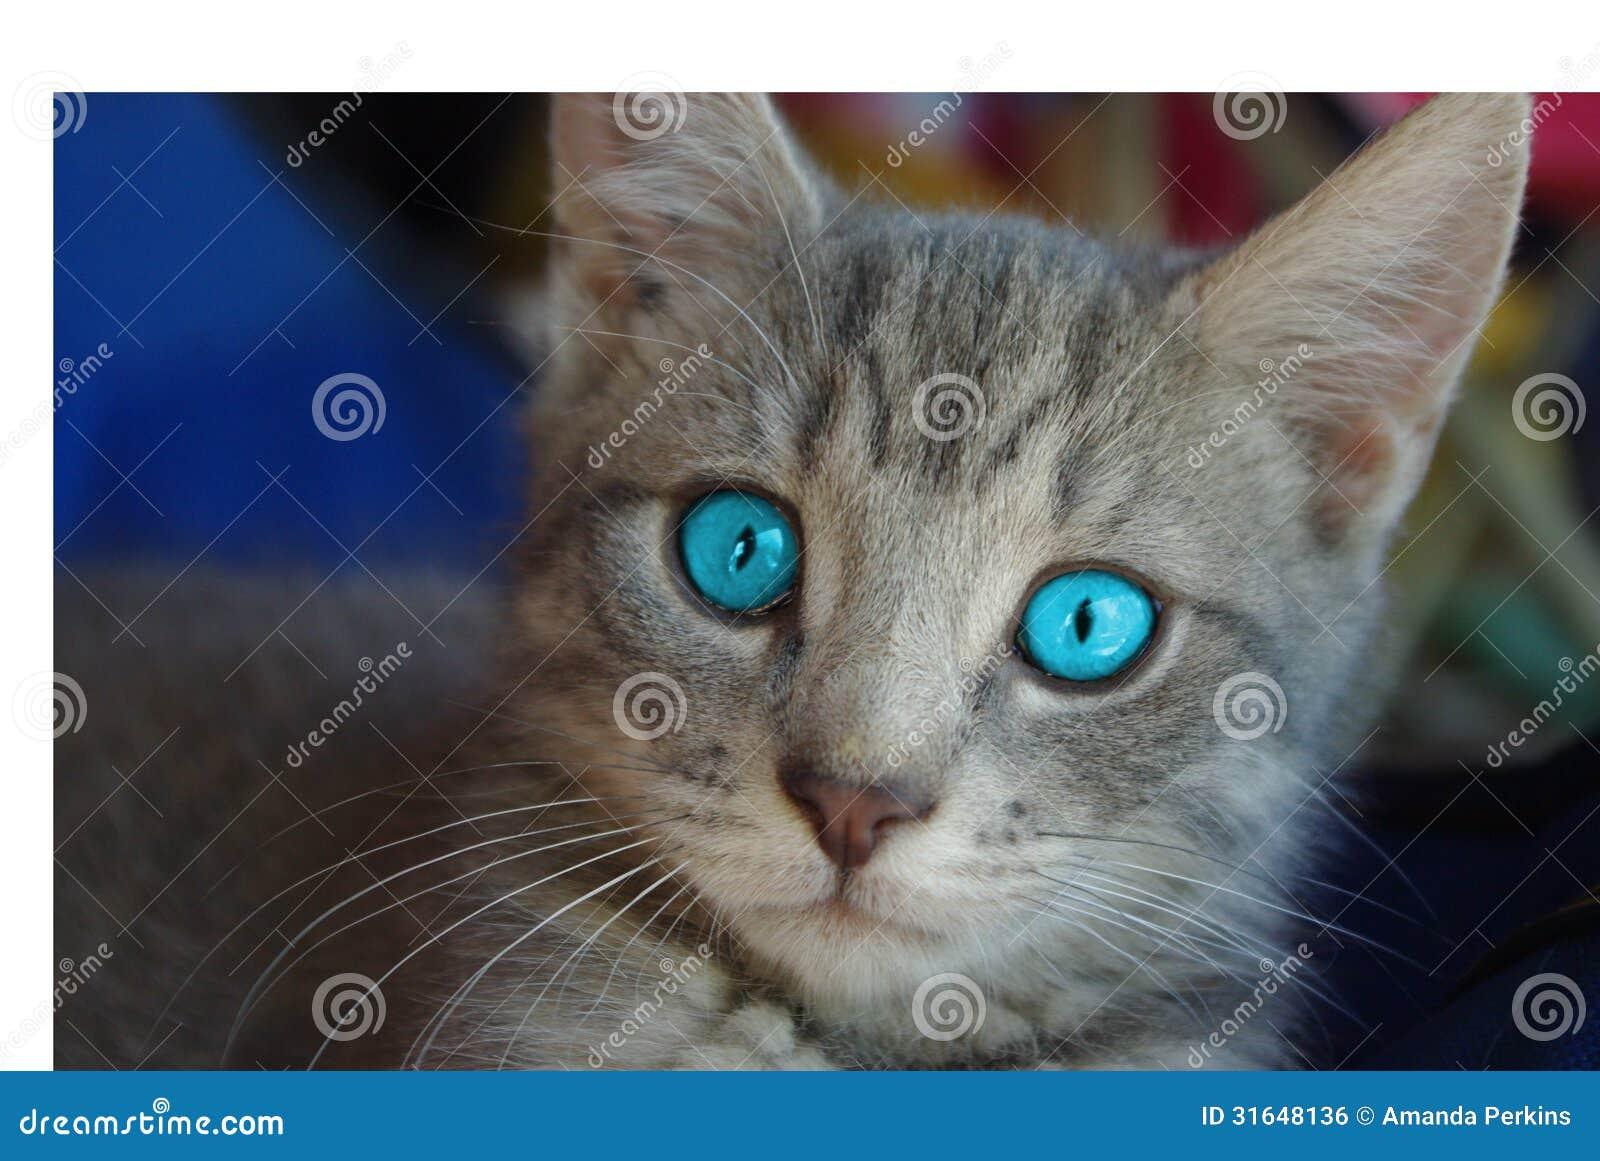 Blue Eyed Grey Cat Breed